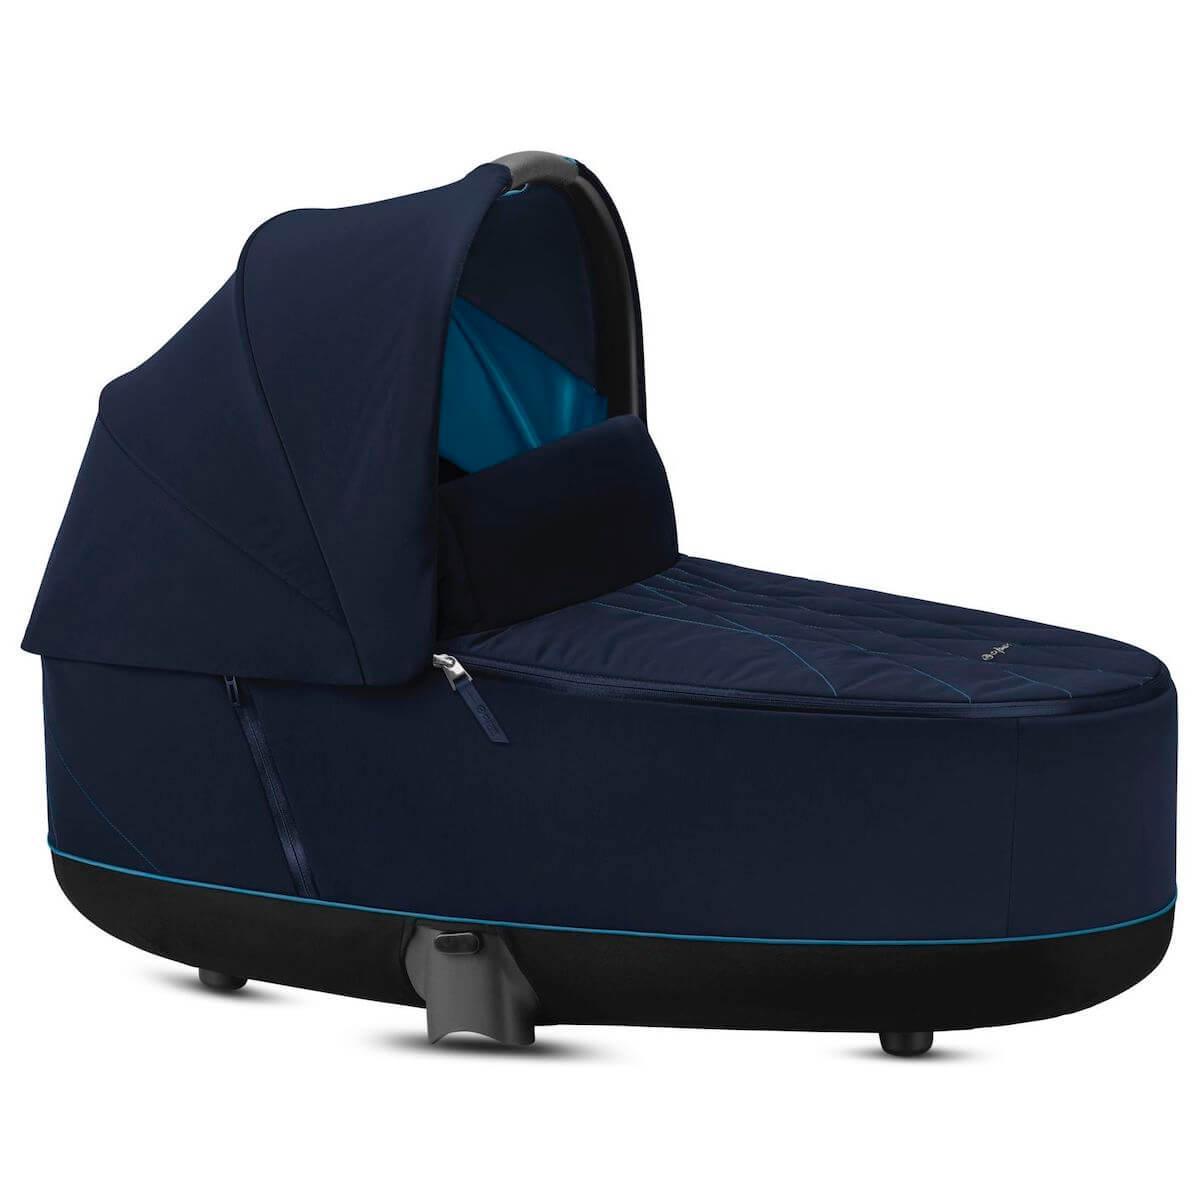 Kinderwagenaufsatz luxe PRIAM Cybex Nautical Blue